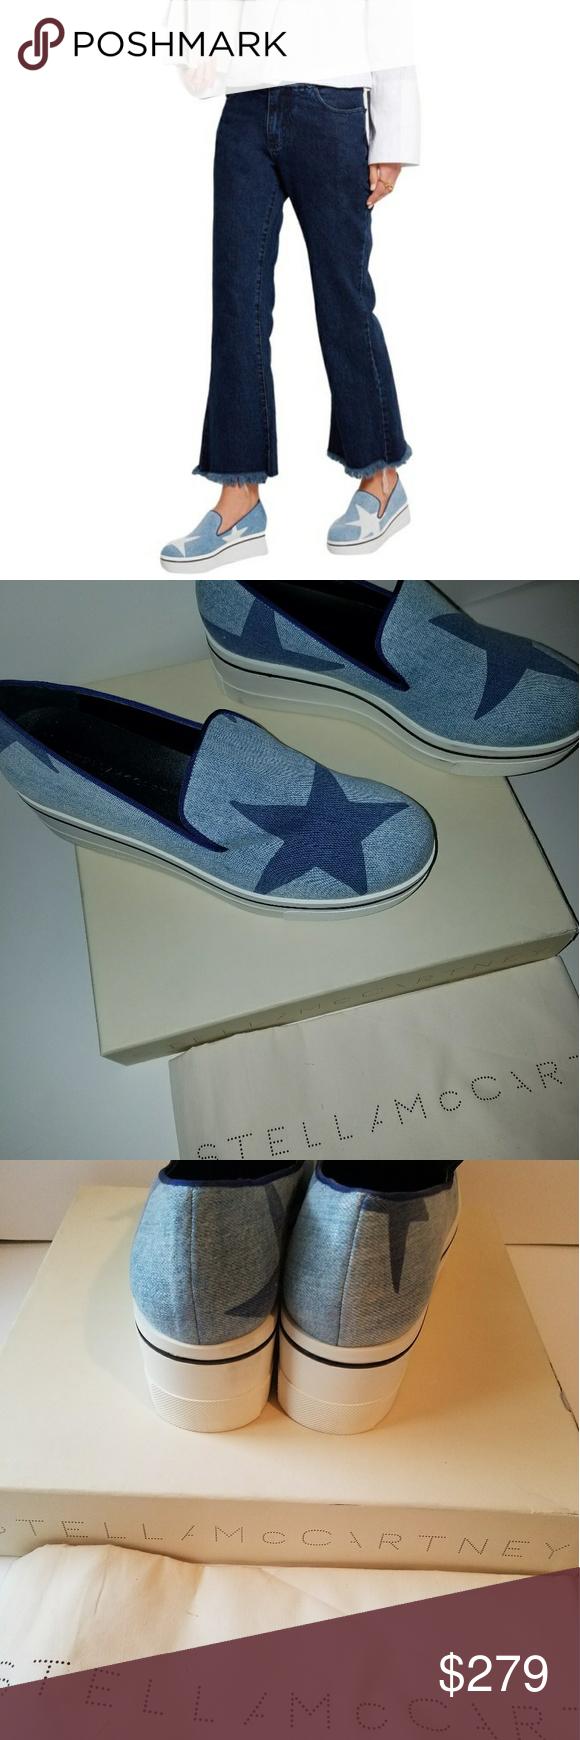 Stella McCartney Binx Star Slip-On